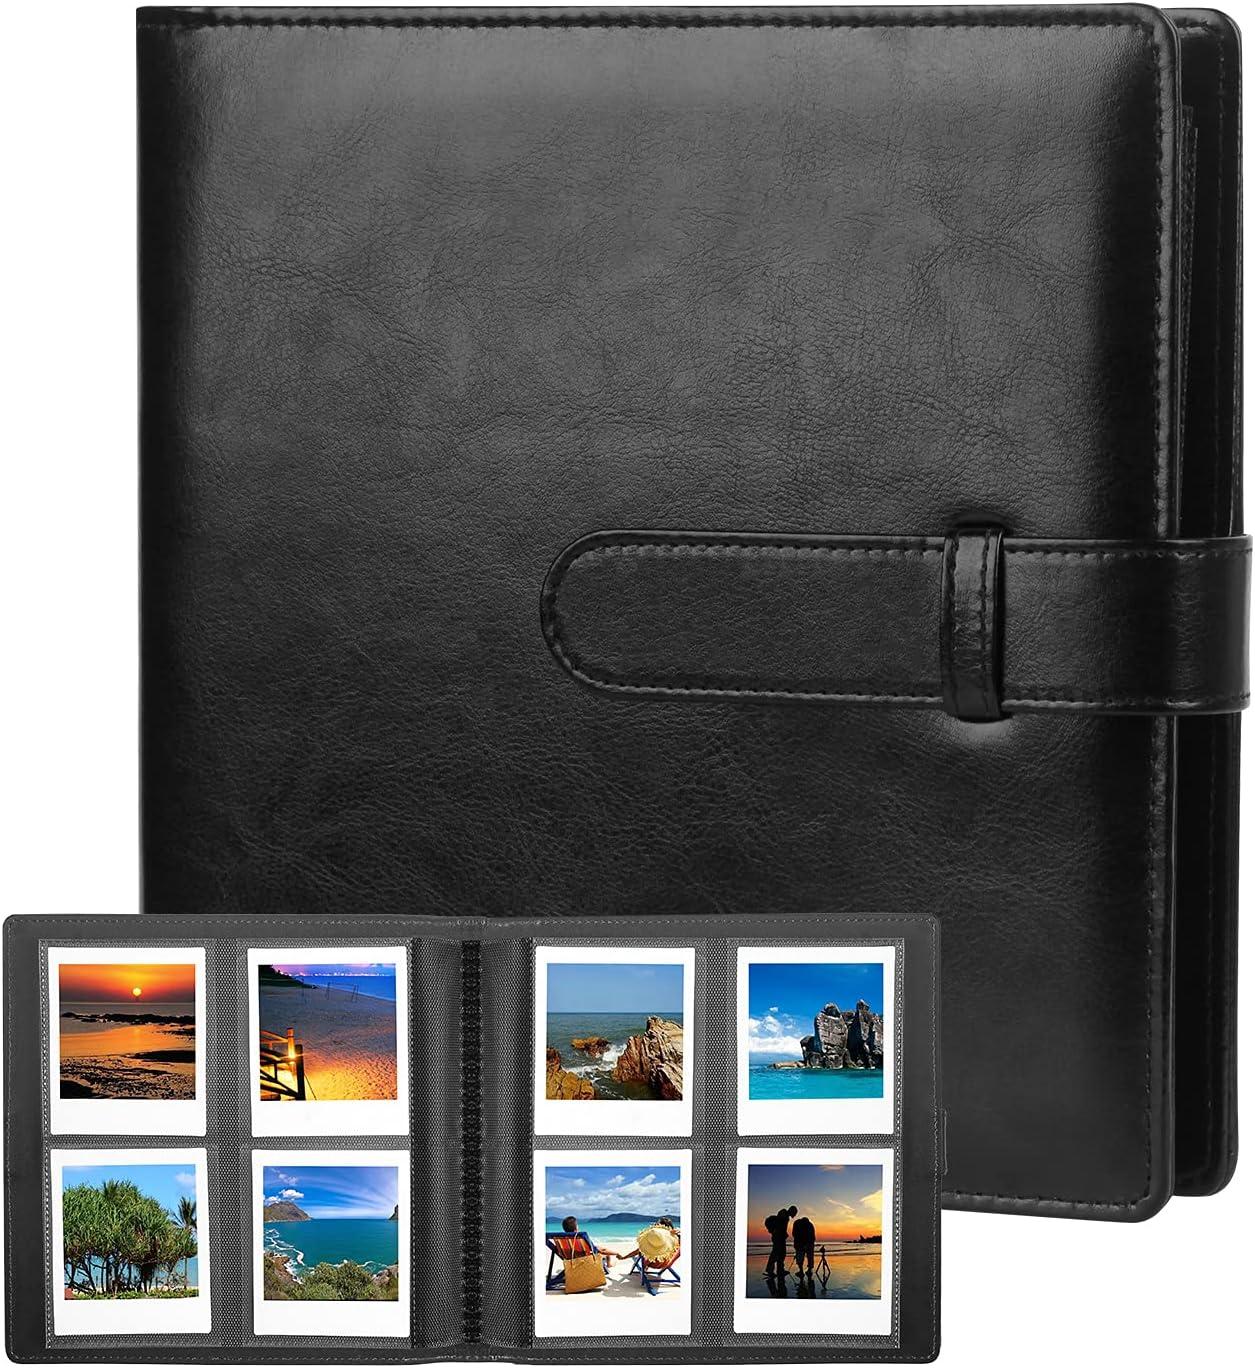 192 Pockets Photo Album for Fujifilm SQ10 Instax Industry No. Direct sale of manufacturer 1 Square SQ6 SQ1